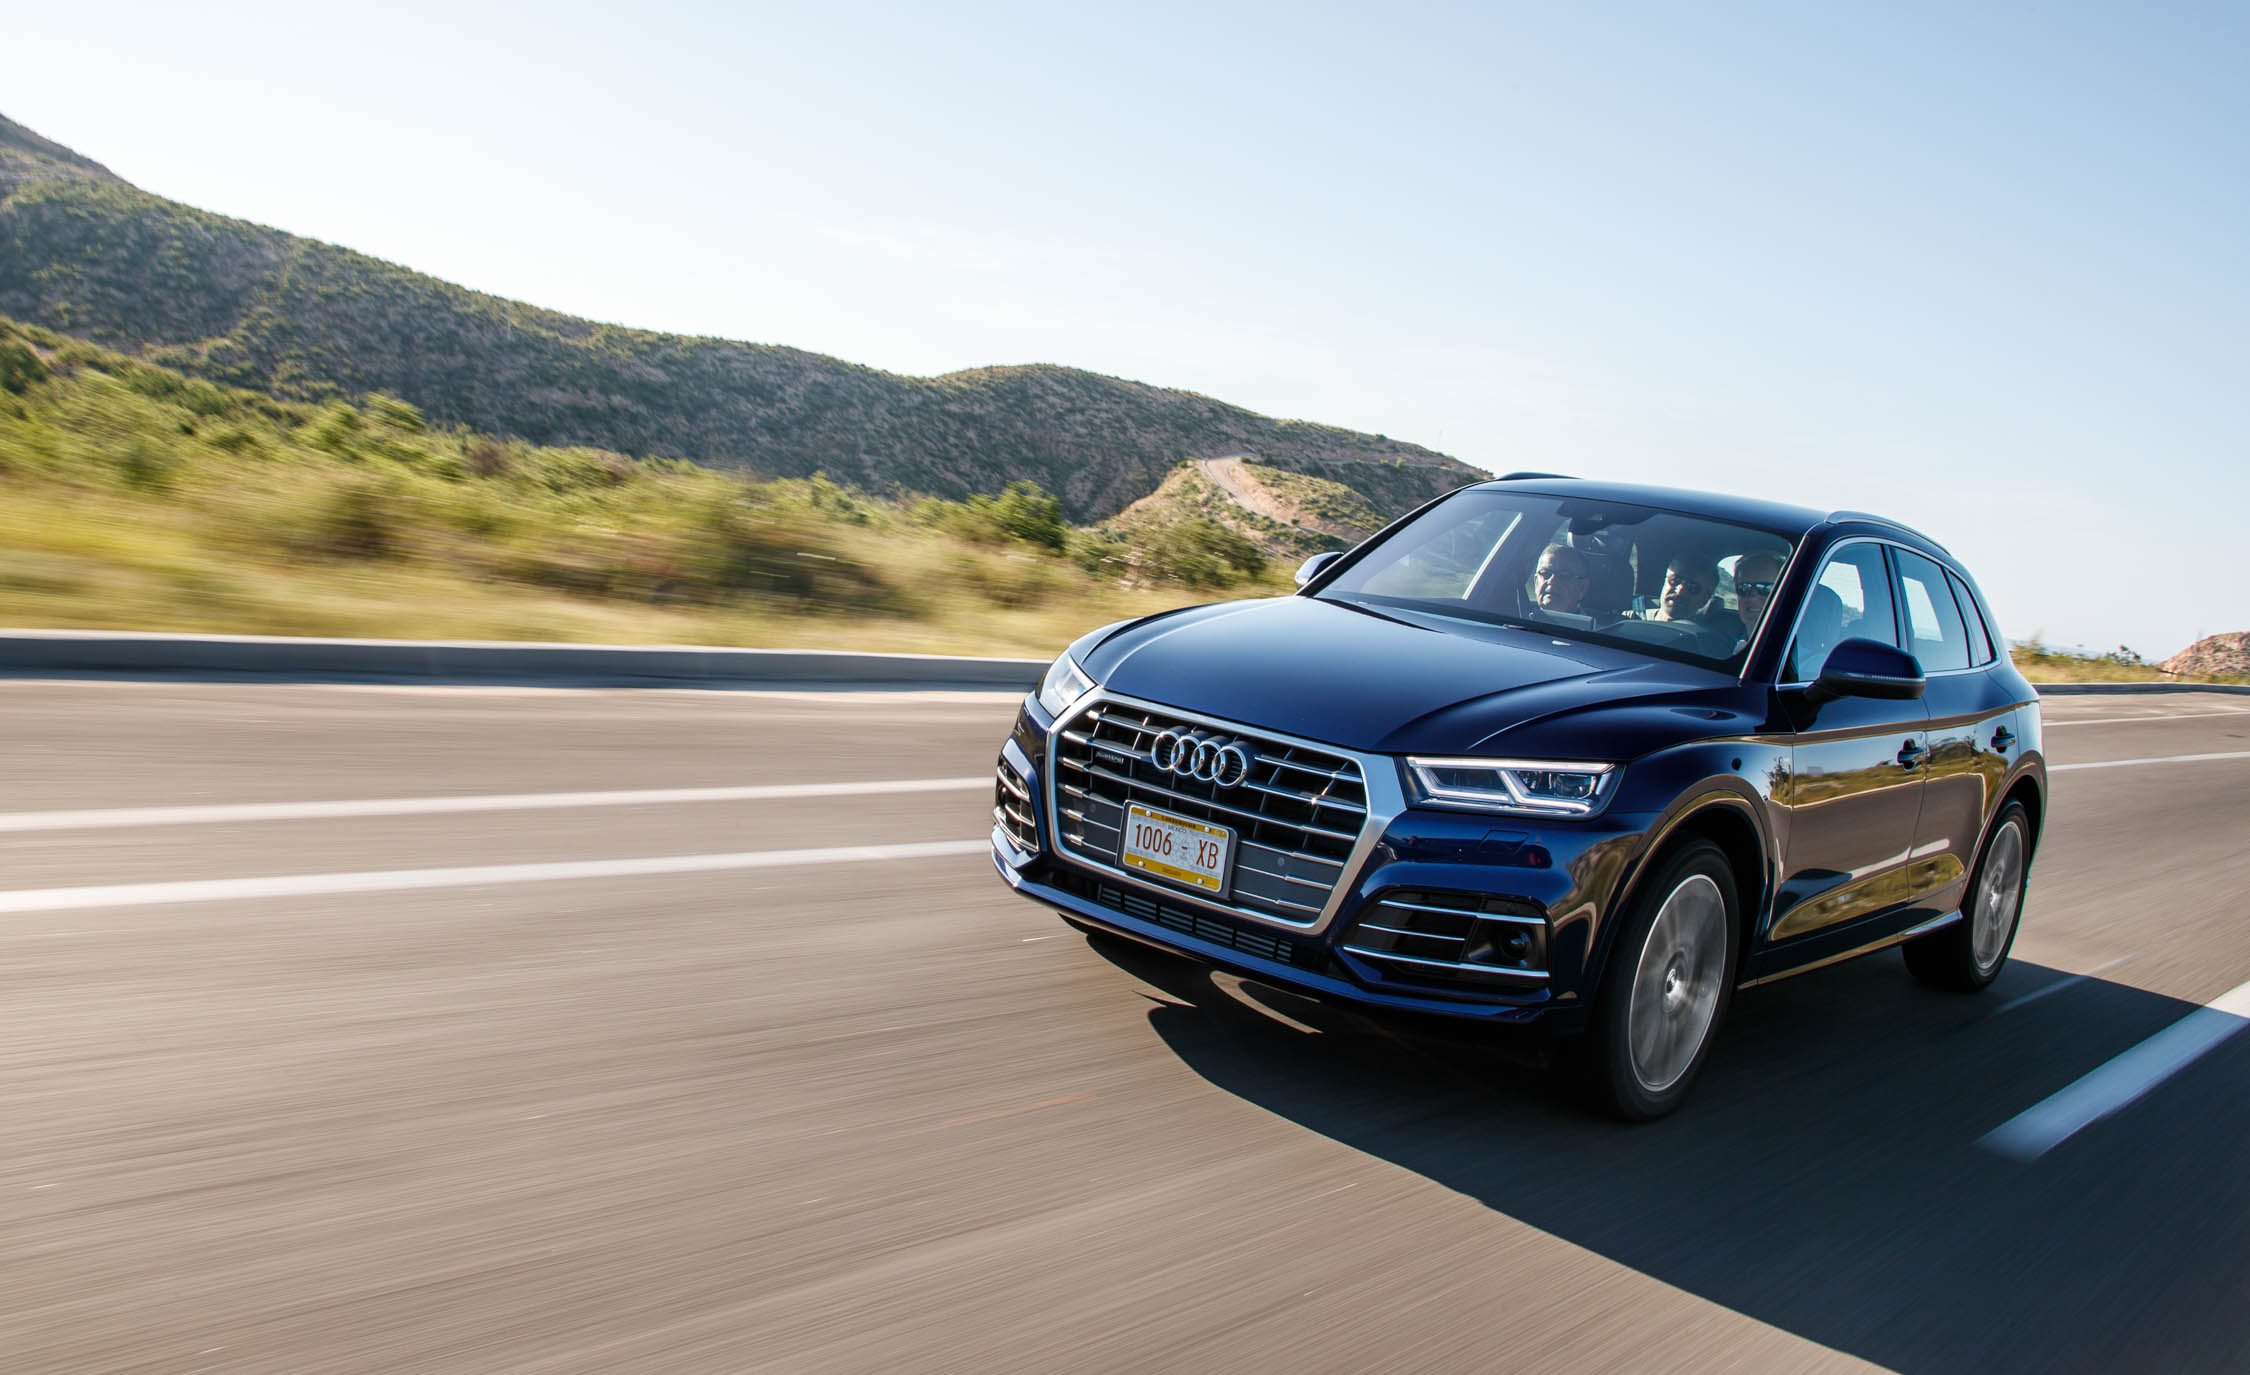 2018 Audi Q (View 31 of 40)